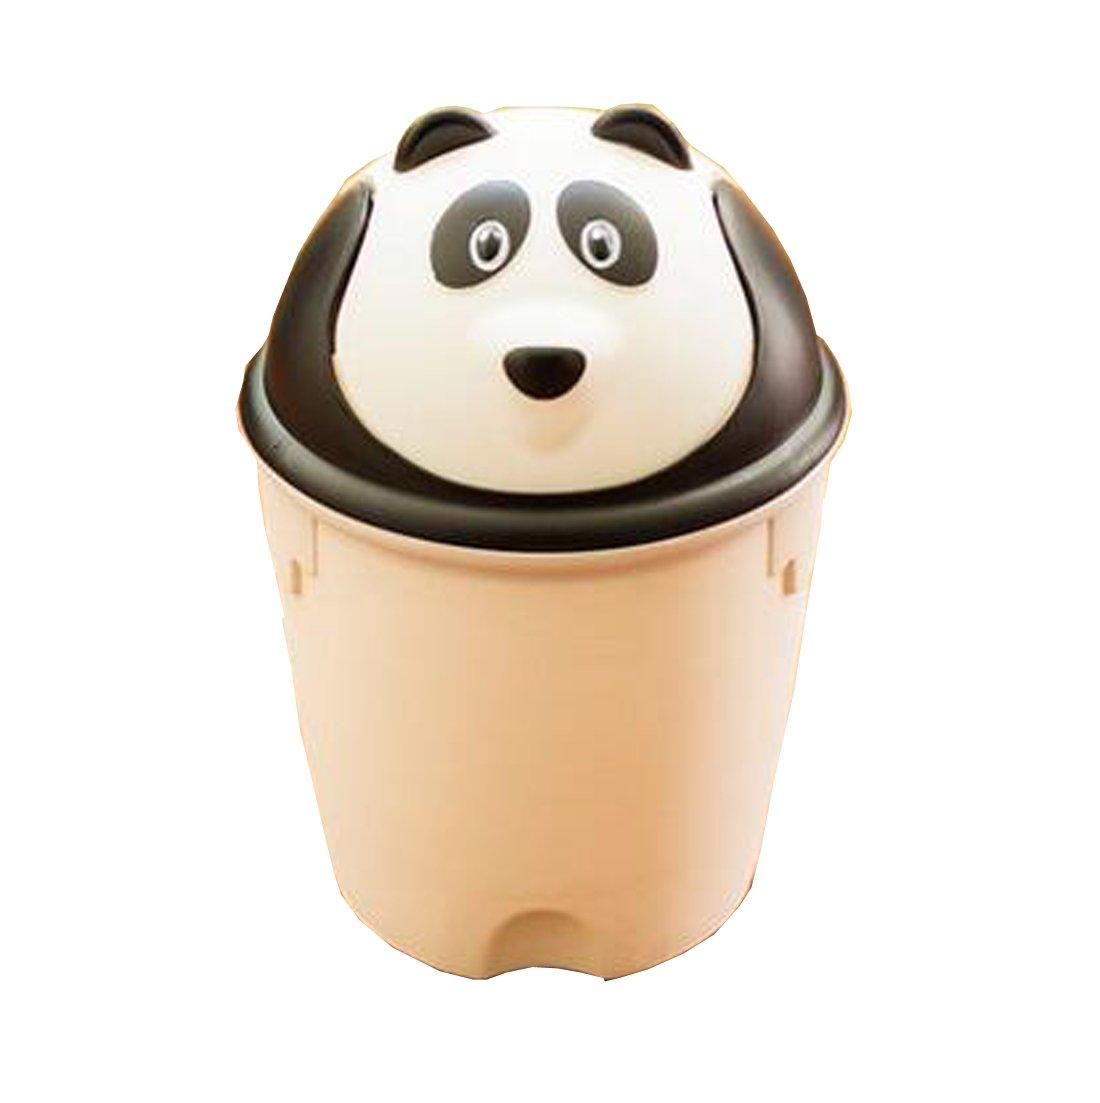 LAN-GO Plastic Animal Cartoon Swing Lid Table Desk Car Mini Trash Can Trash Bin (As description, White panda)